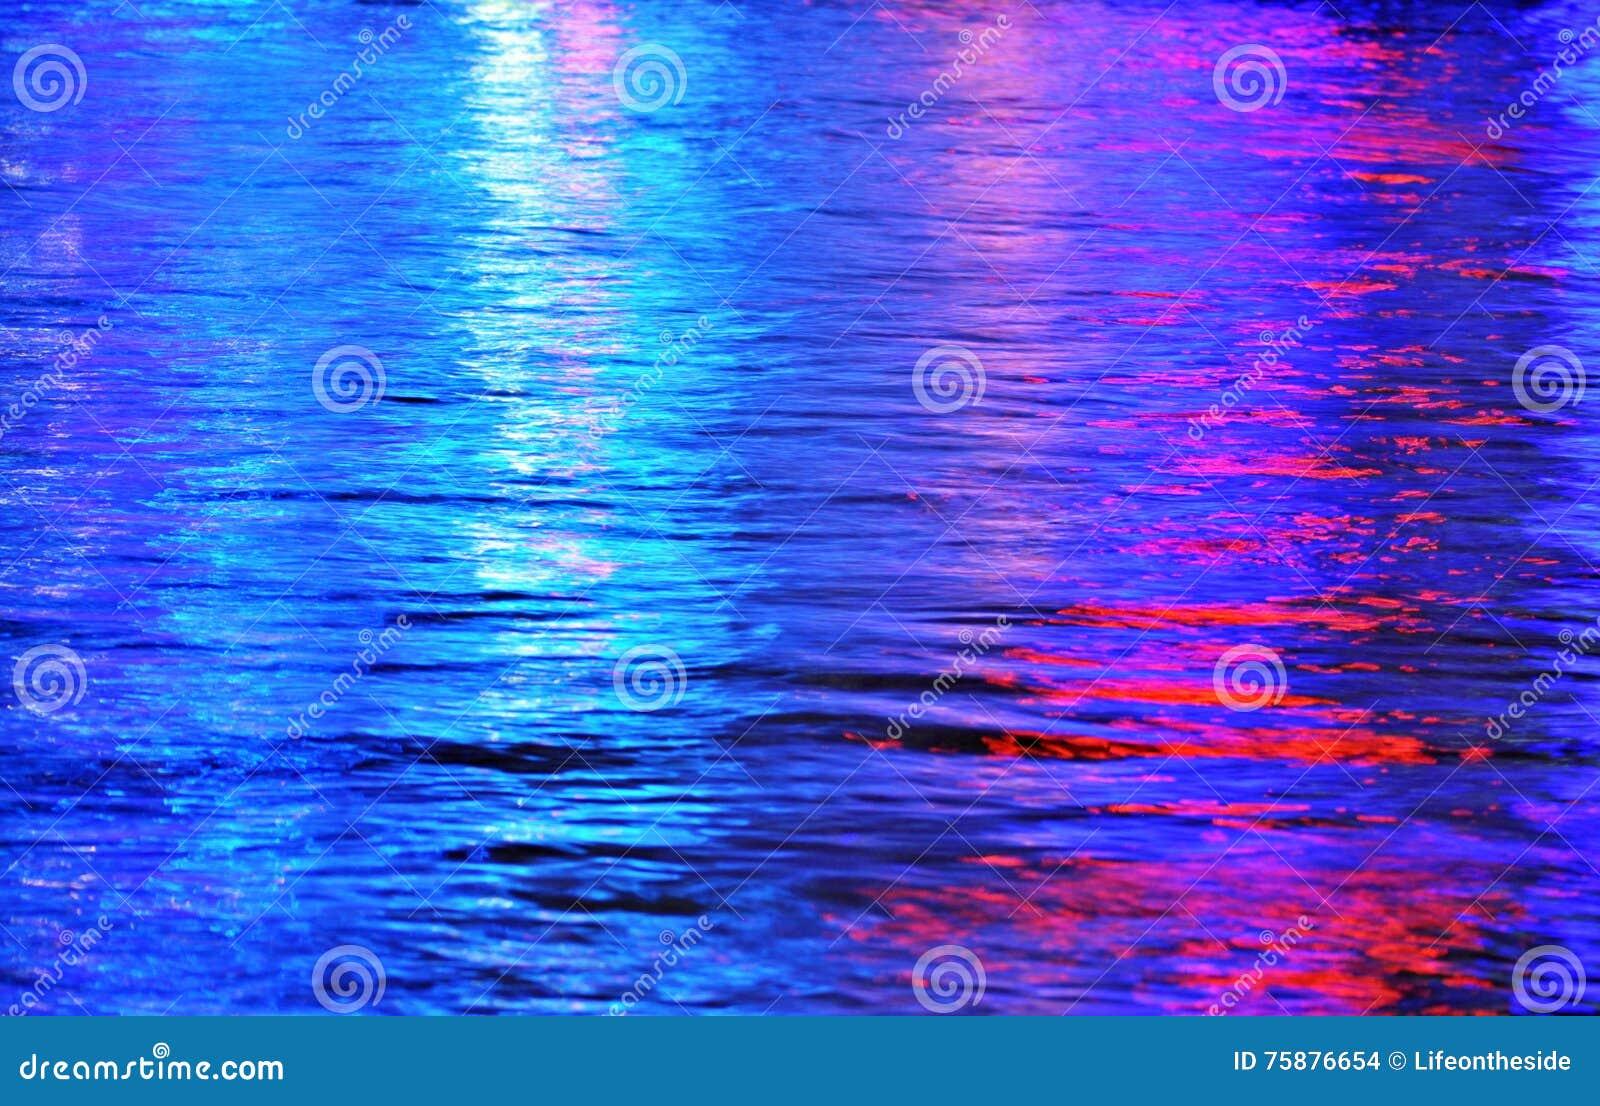 O fundo abstrato colore a água multi-colorida colorida arco-íris